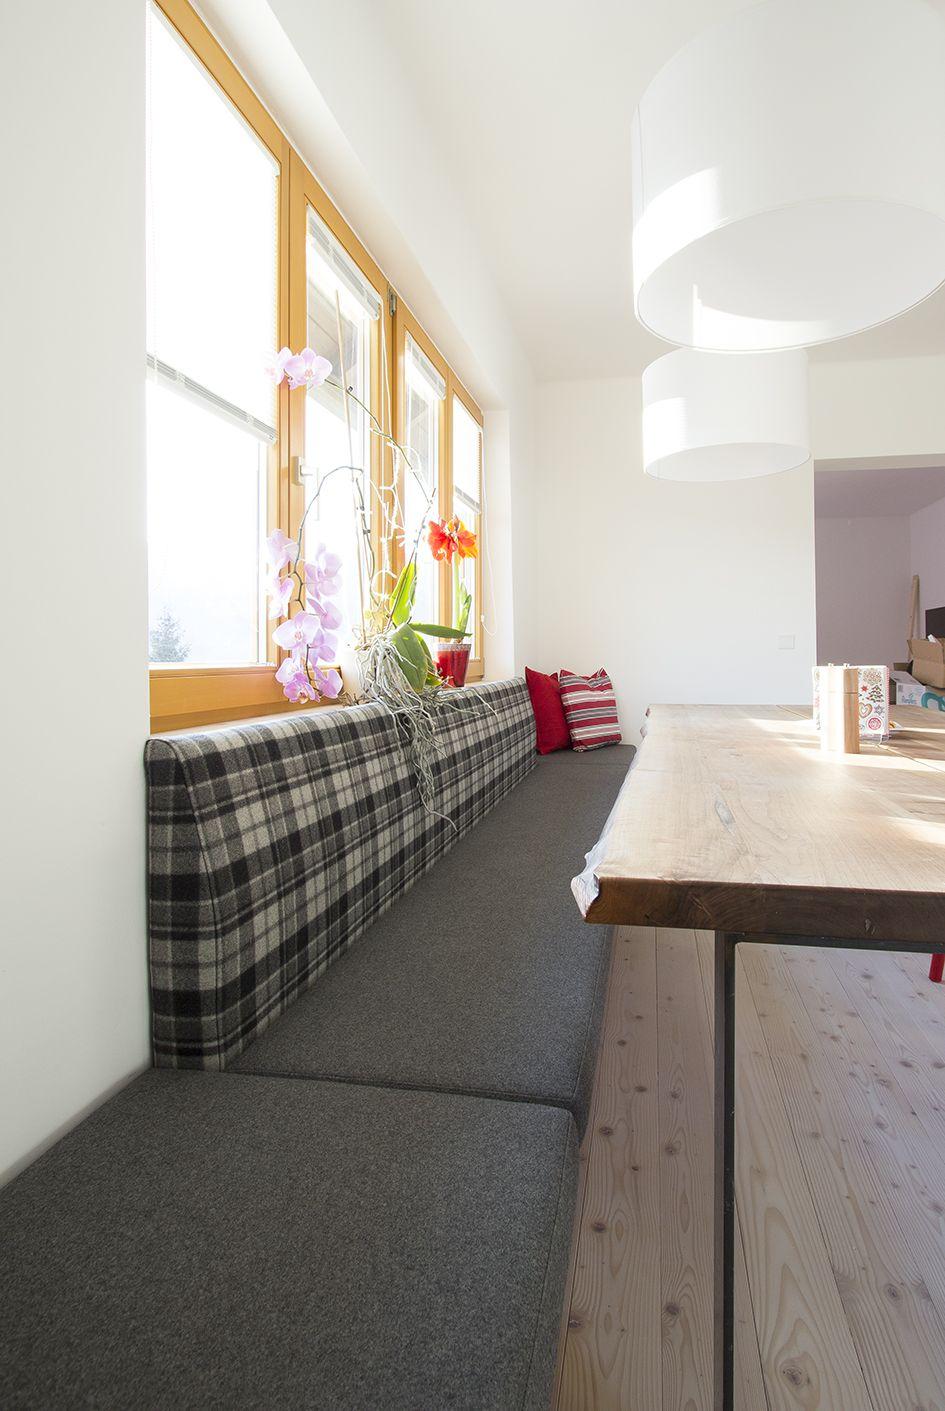 Fünf Meter Lange Sitzbank   Raumlang, Tapeziert Mit Lodenstoff Home Decor,  Family Dining Rooms